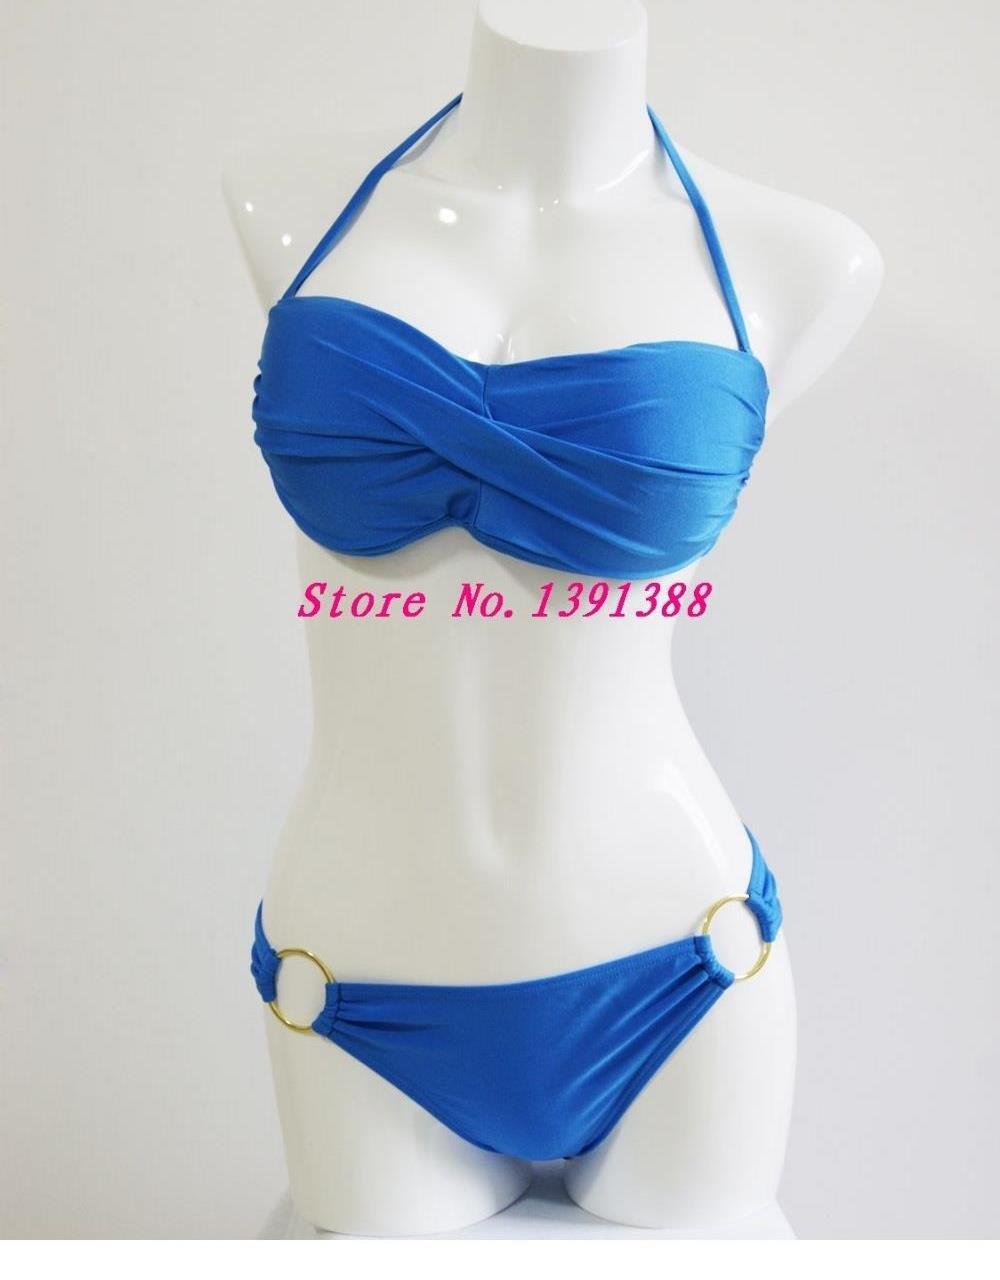 Sexy Padded L Size Summer Bathing Suit Bikini Swimwear W399432